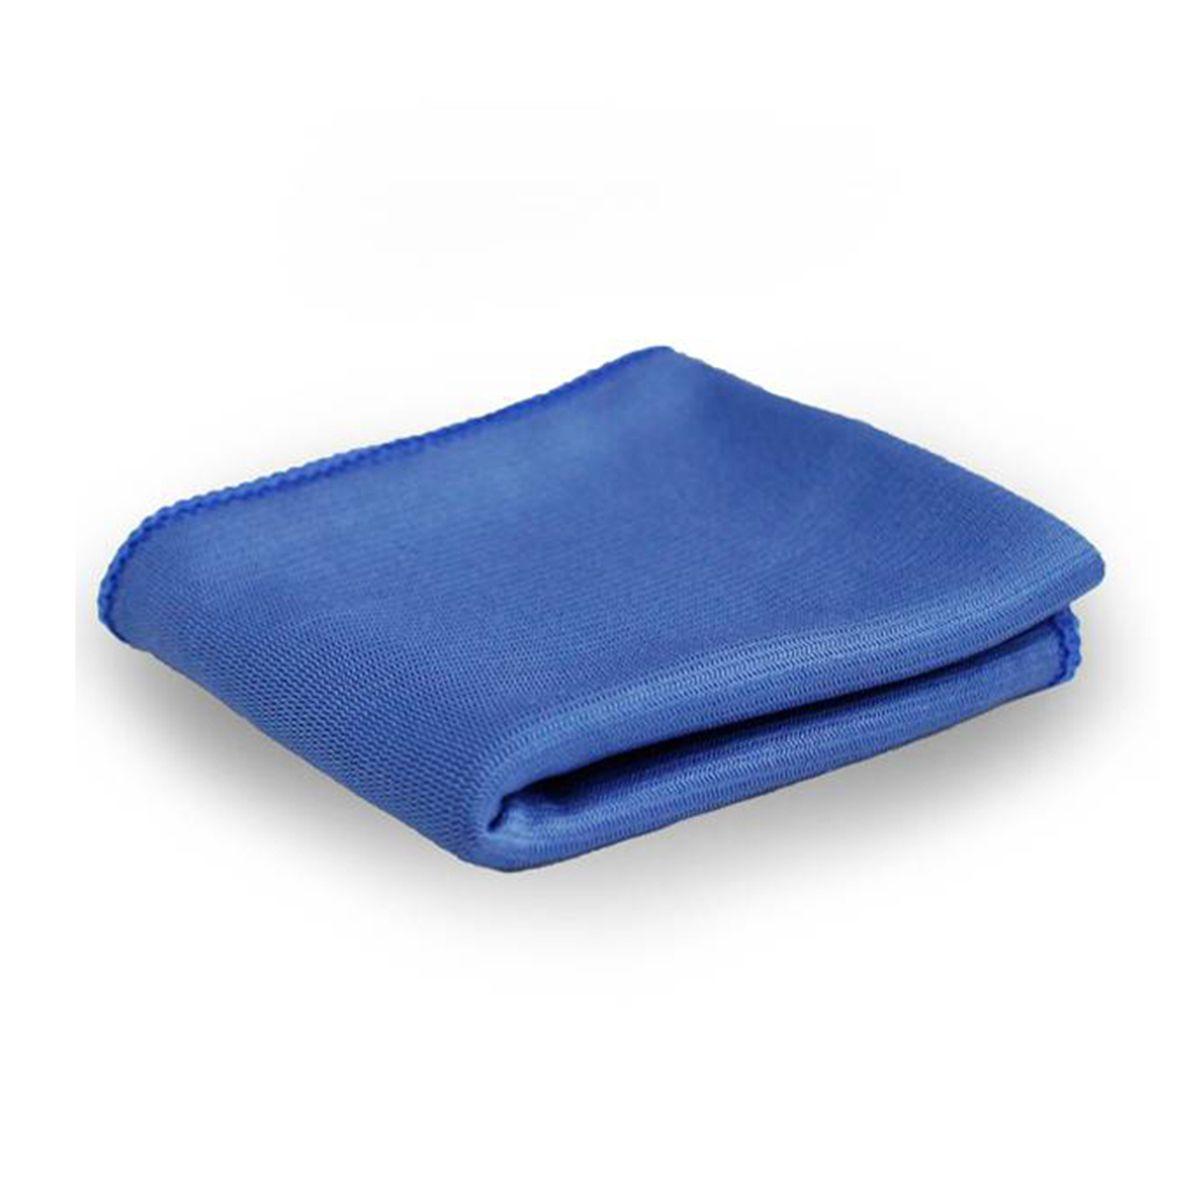 Pano de Vidro 38X38cm Azul 4Wash